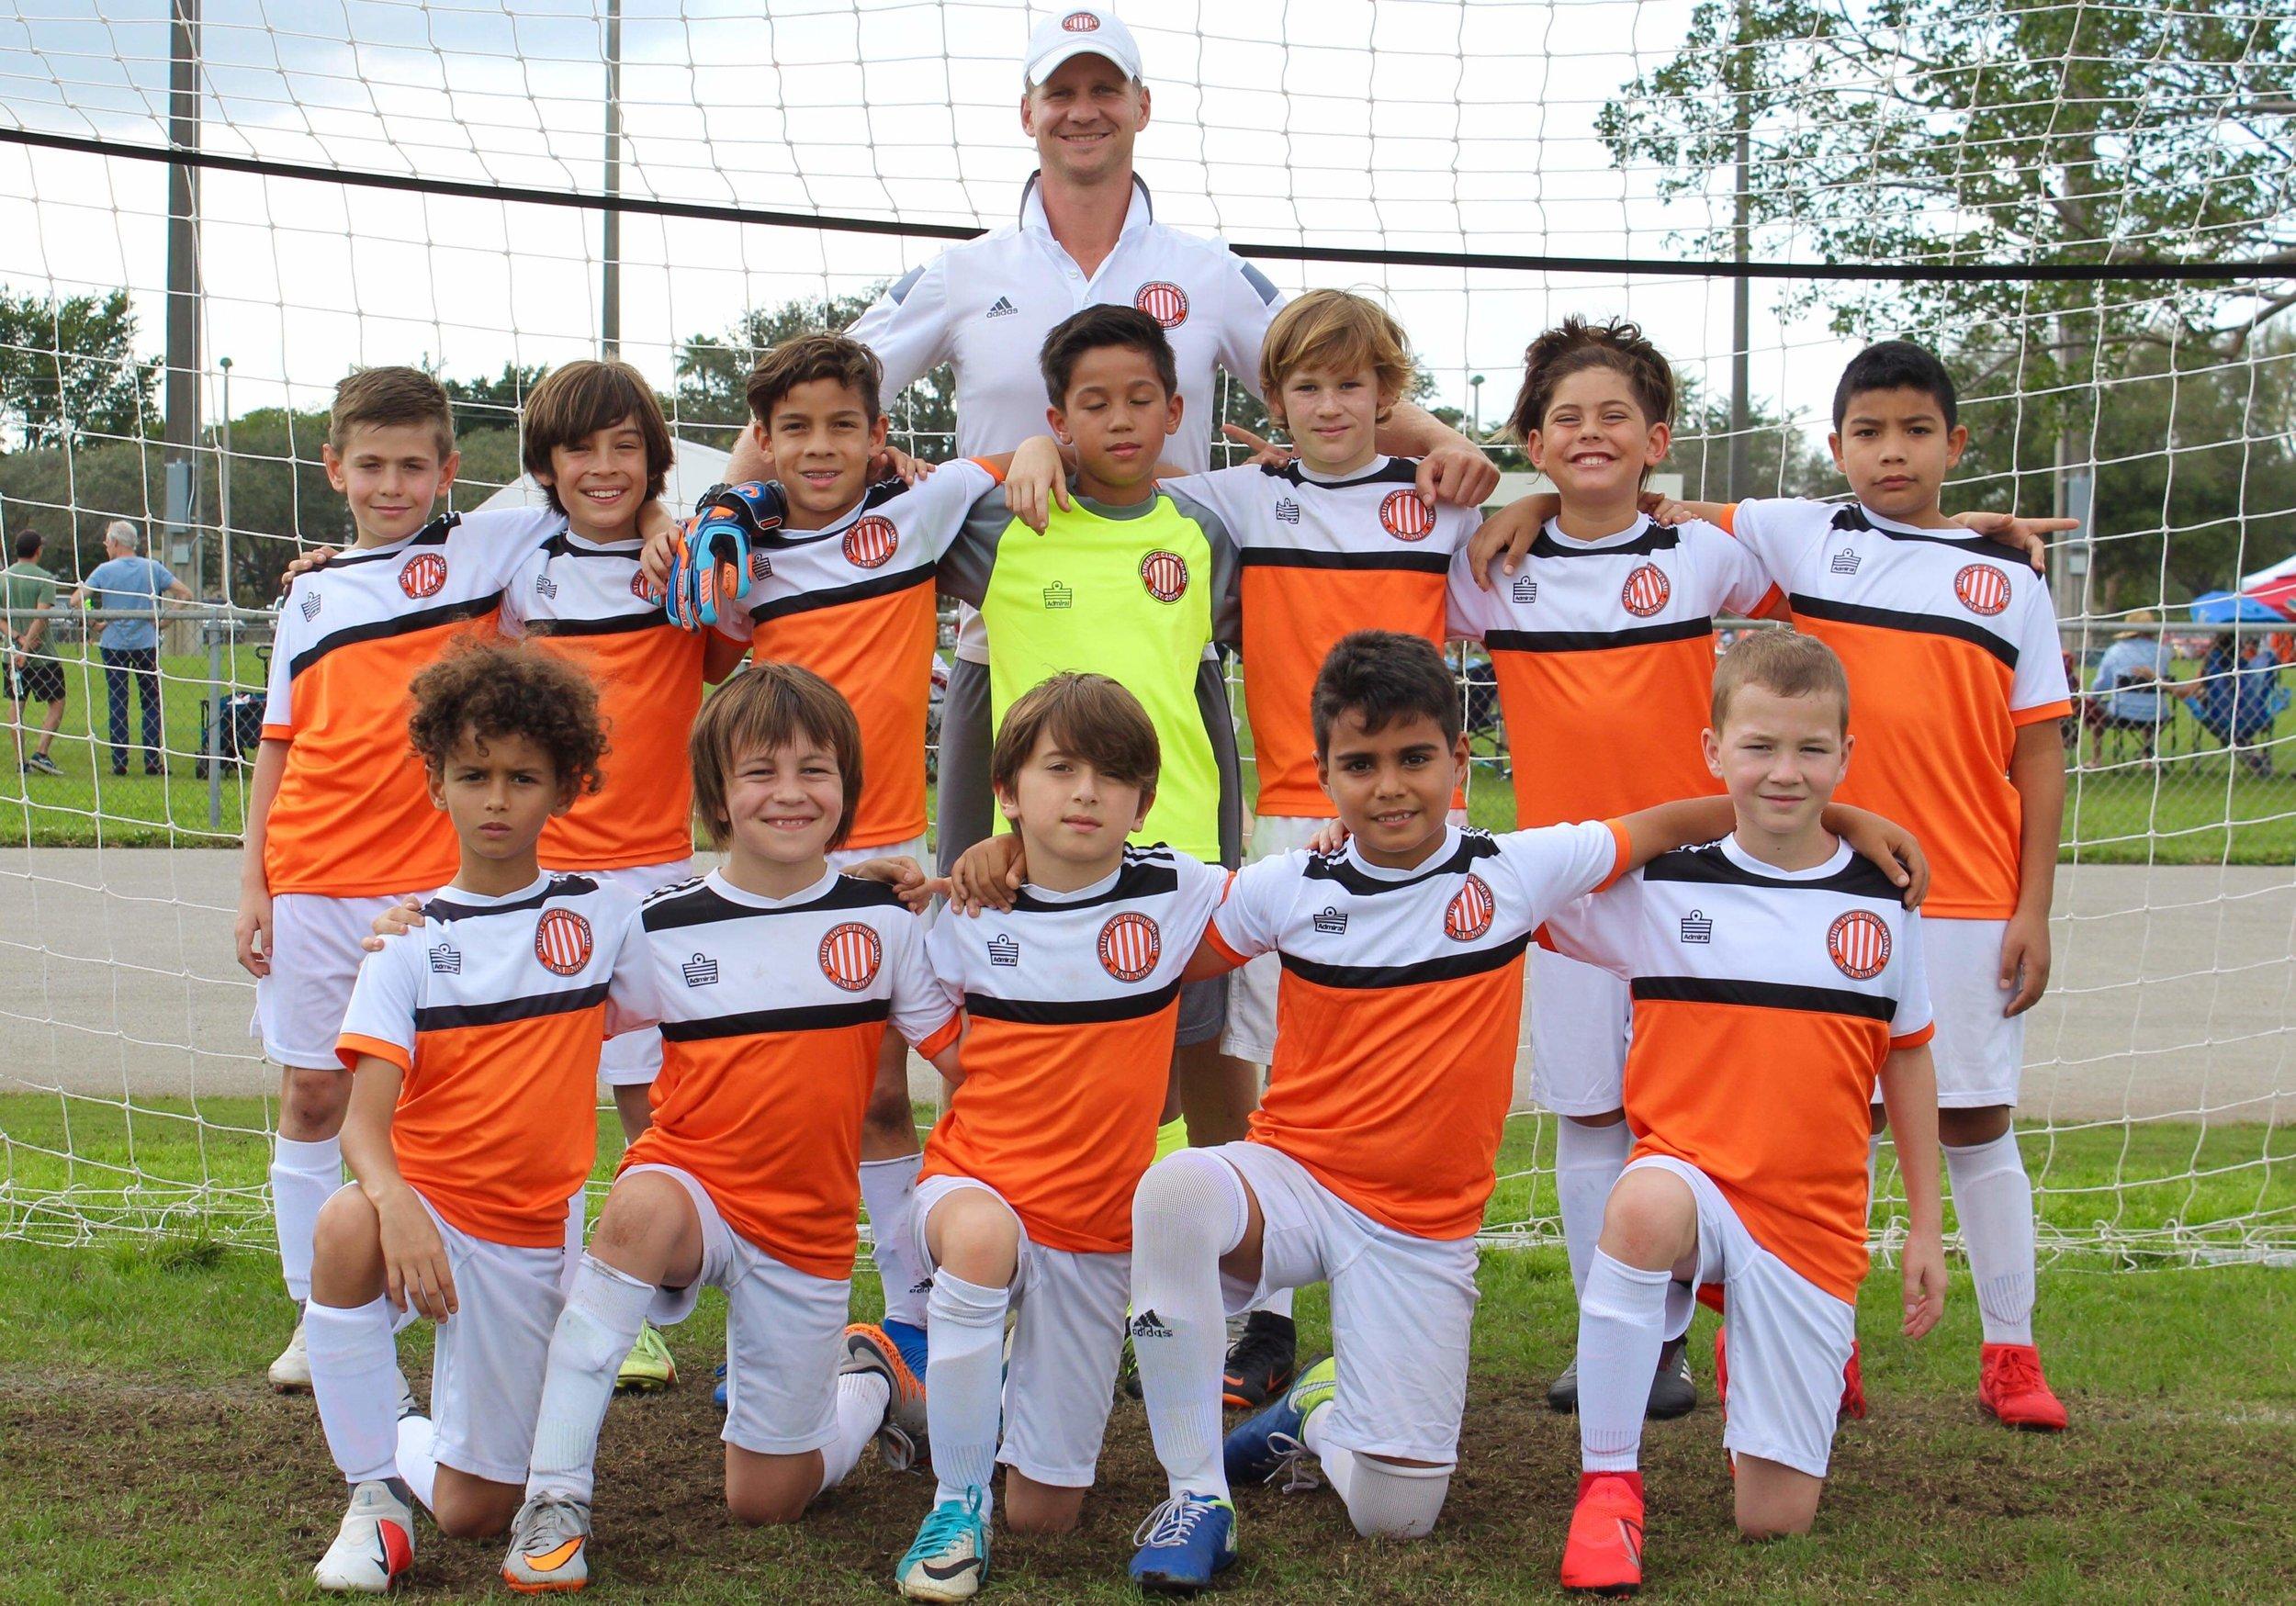 THE AC Miami U10 Soccer Team.jpeg